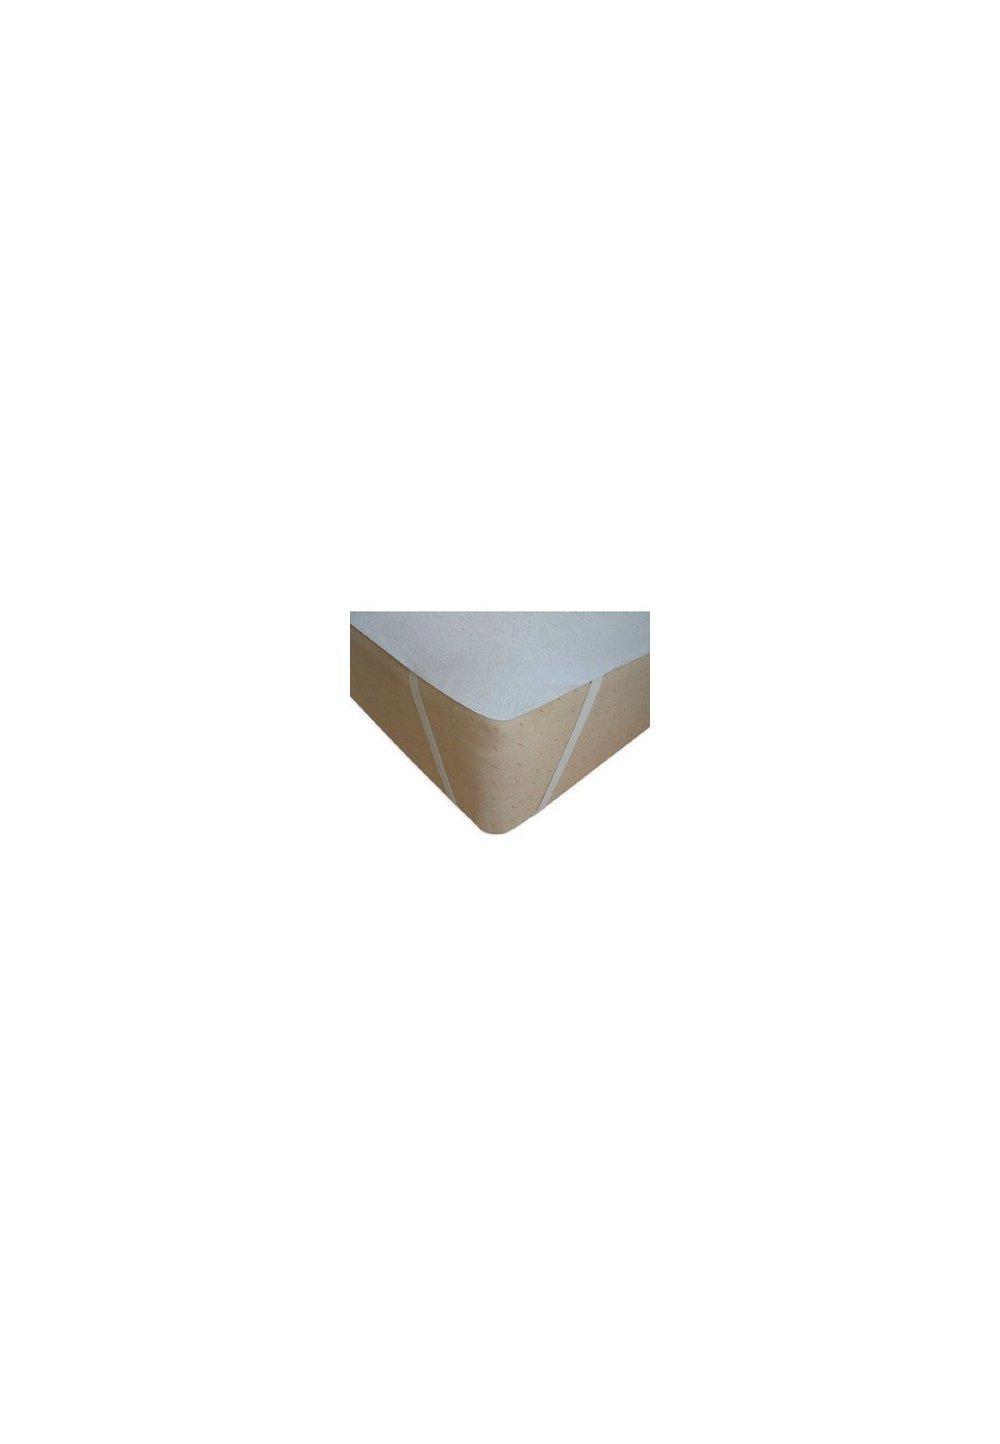 Protectie saltea, impermeabila, alba 120x60cm imagine